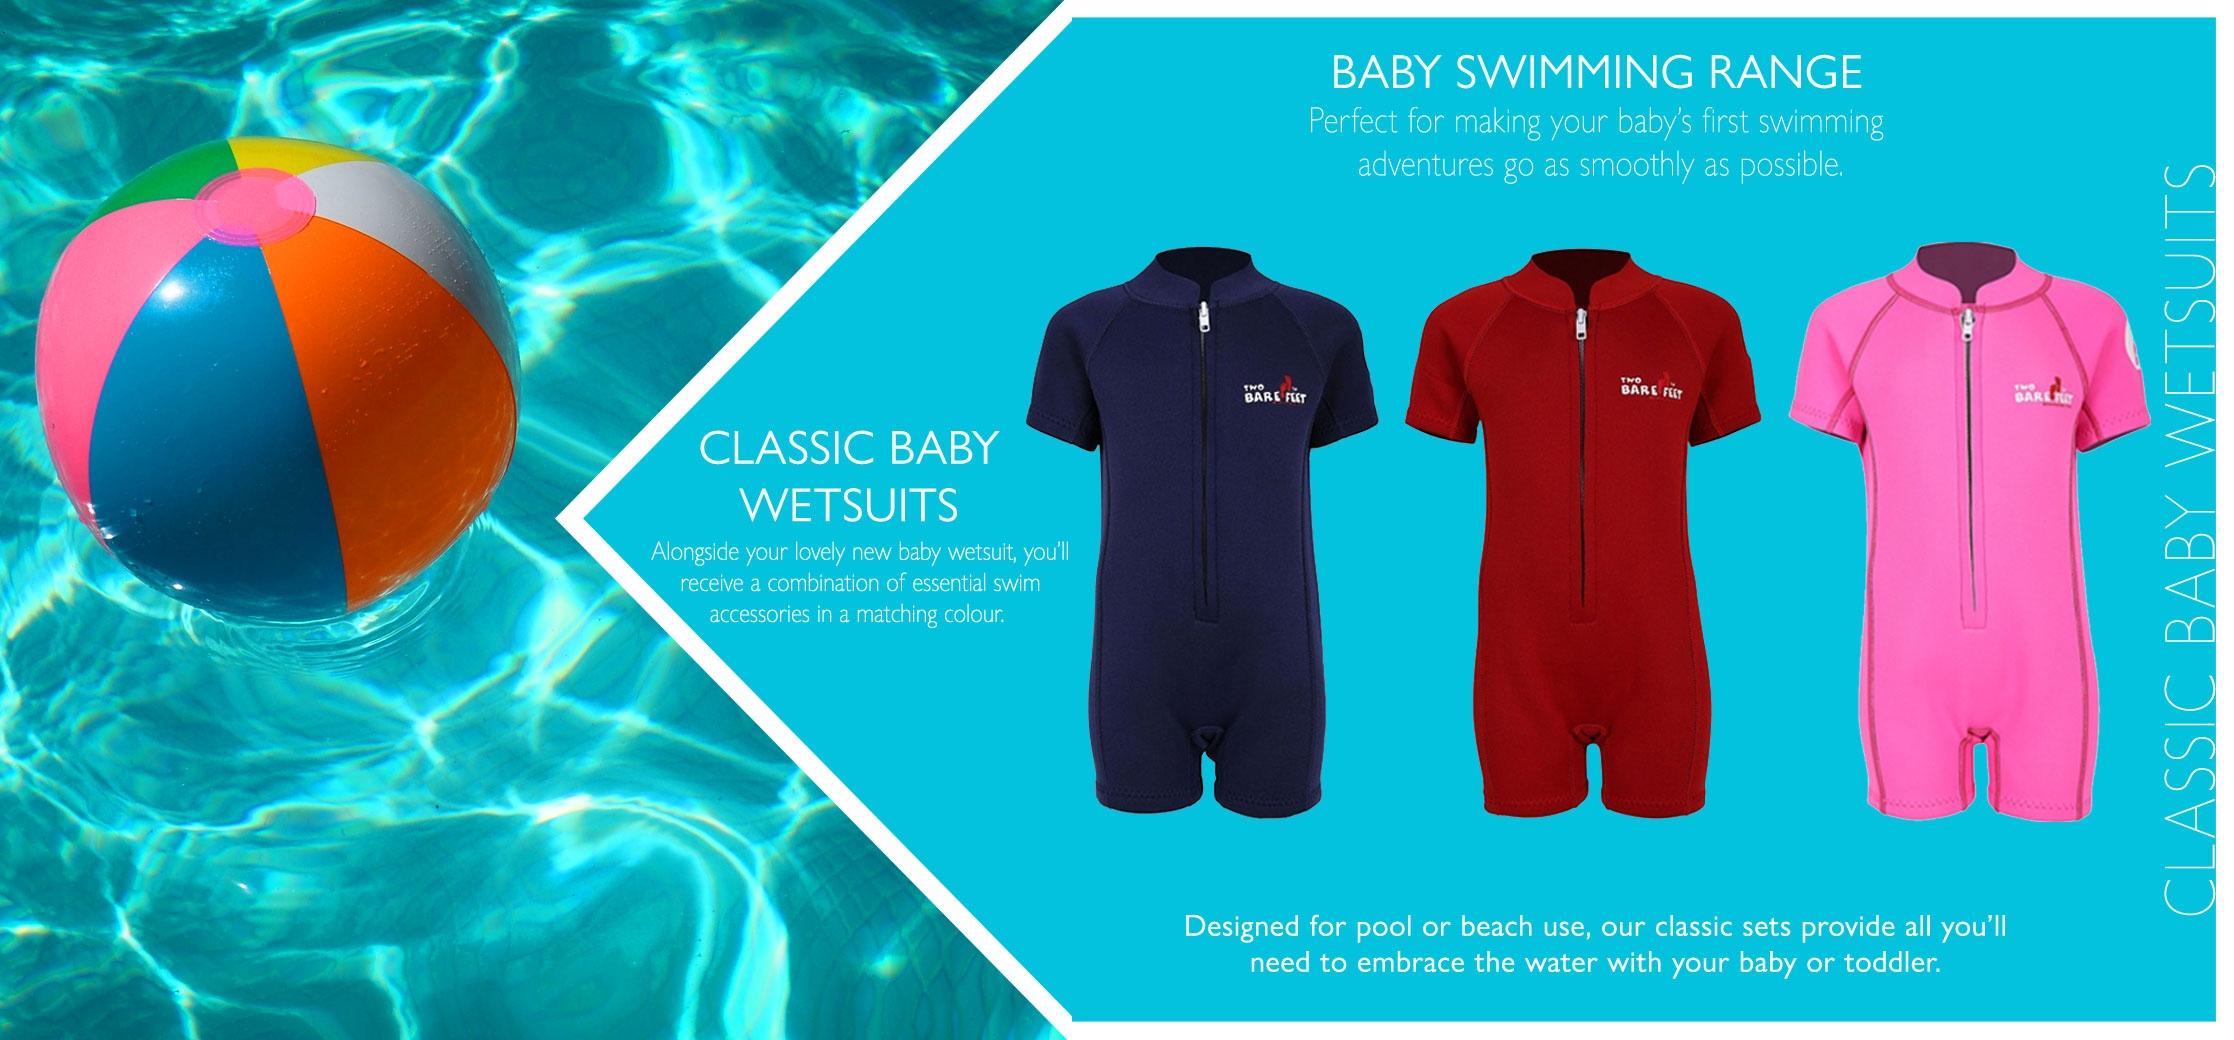 Neoprene classic baby wetsuit set info